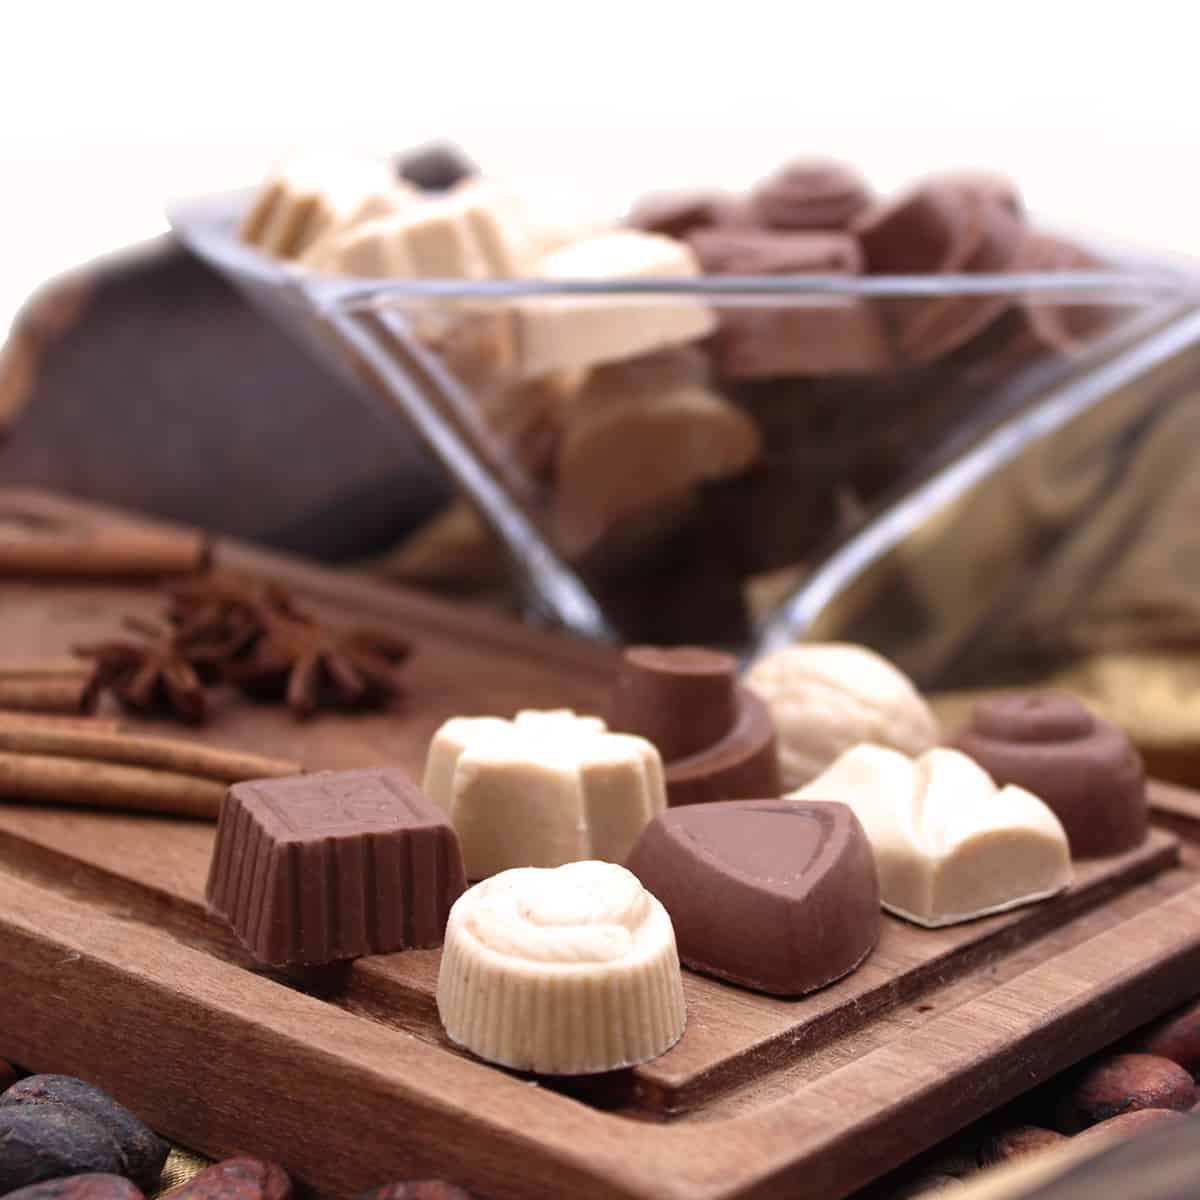 Chocolate Infinity 02